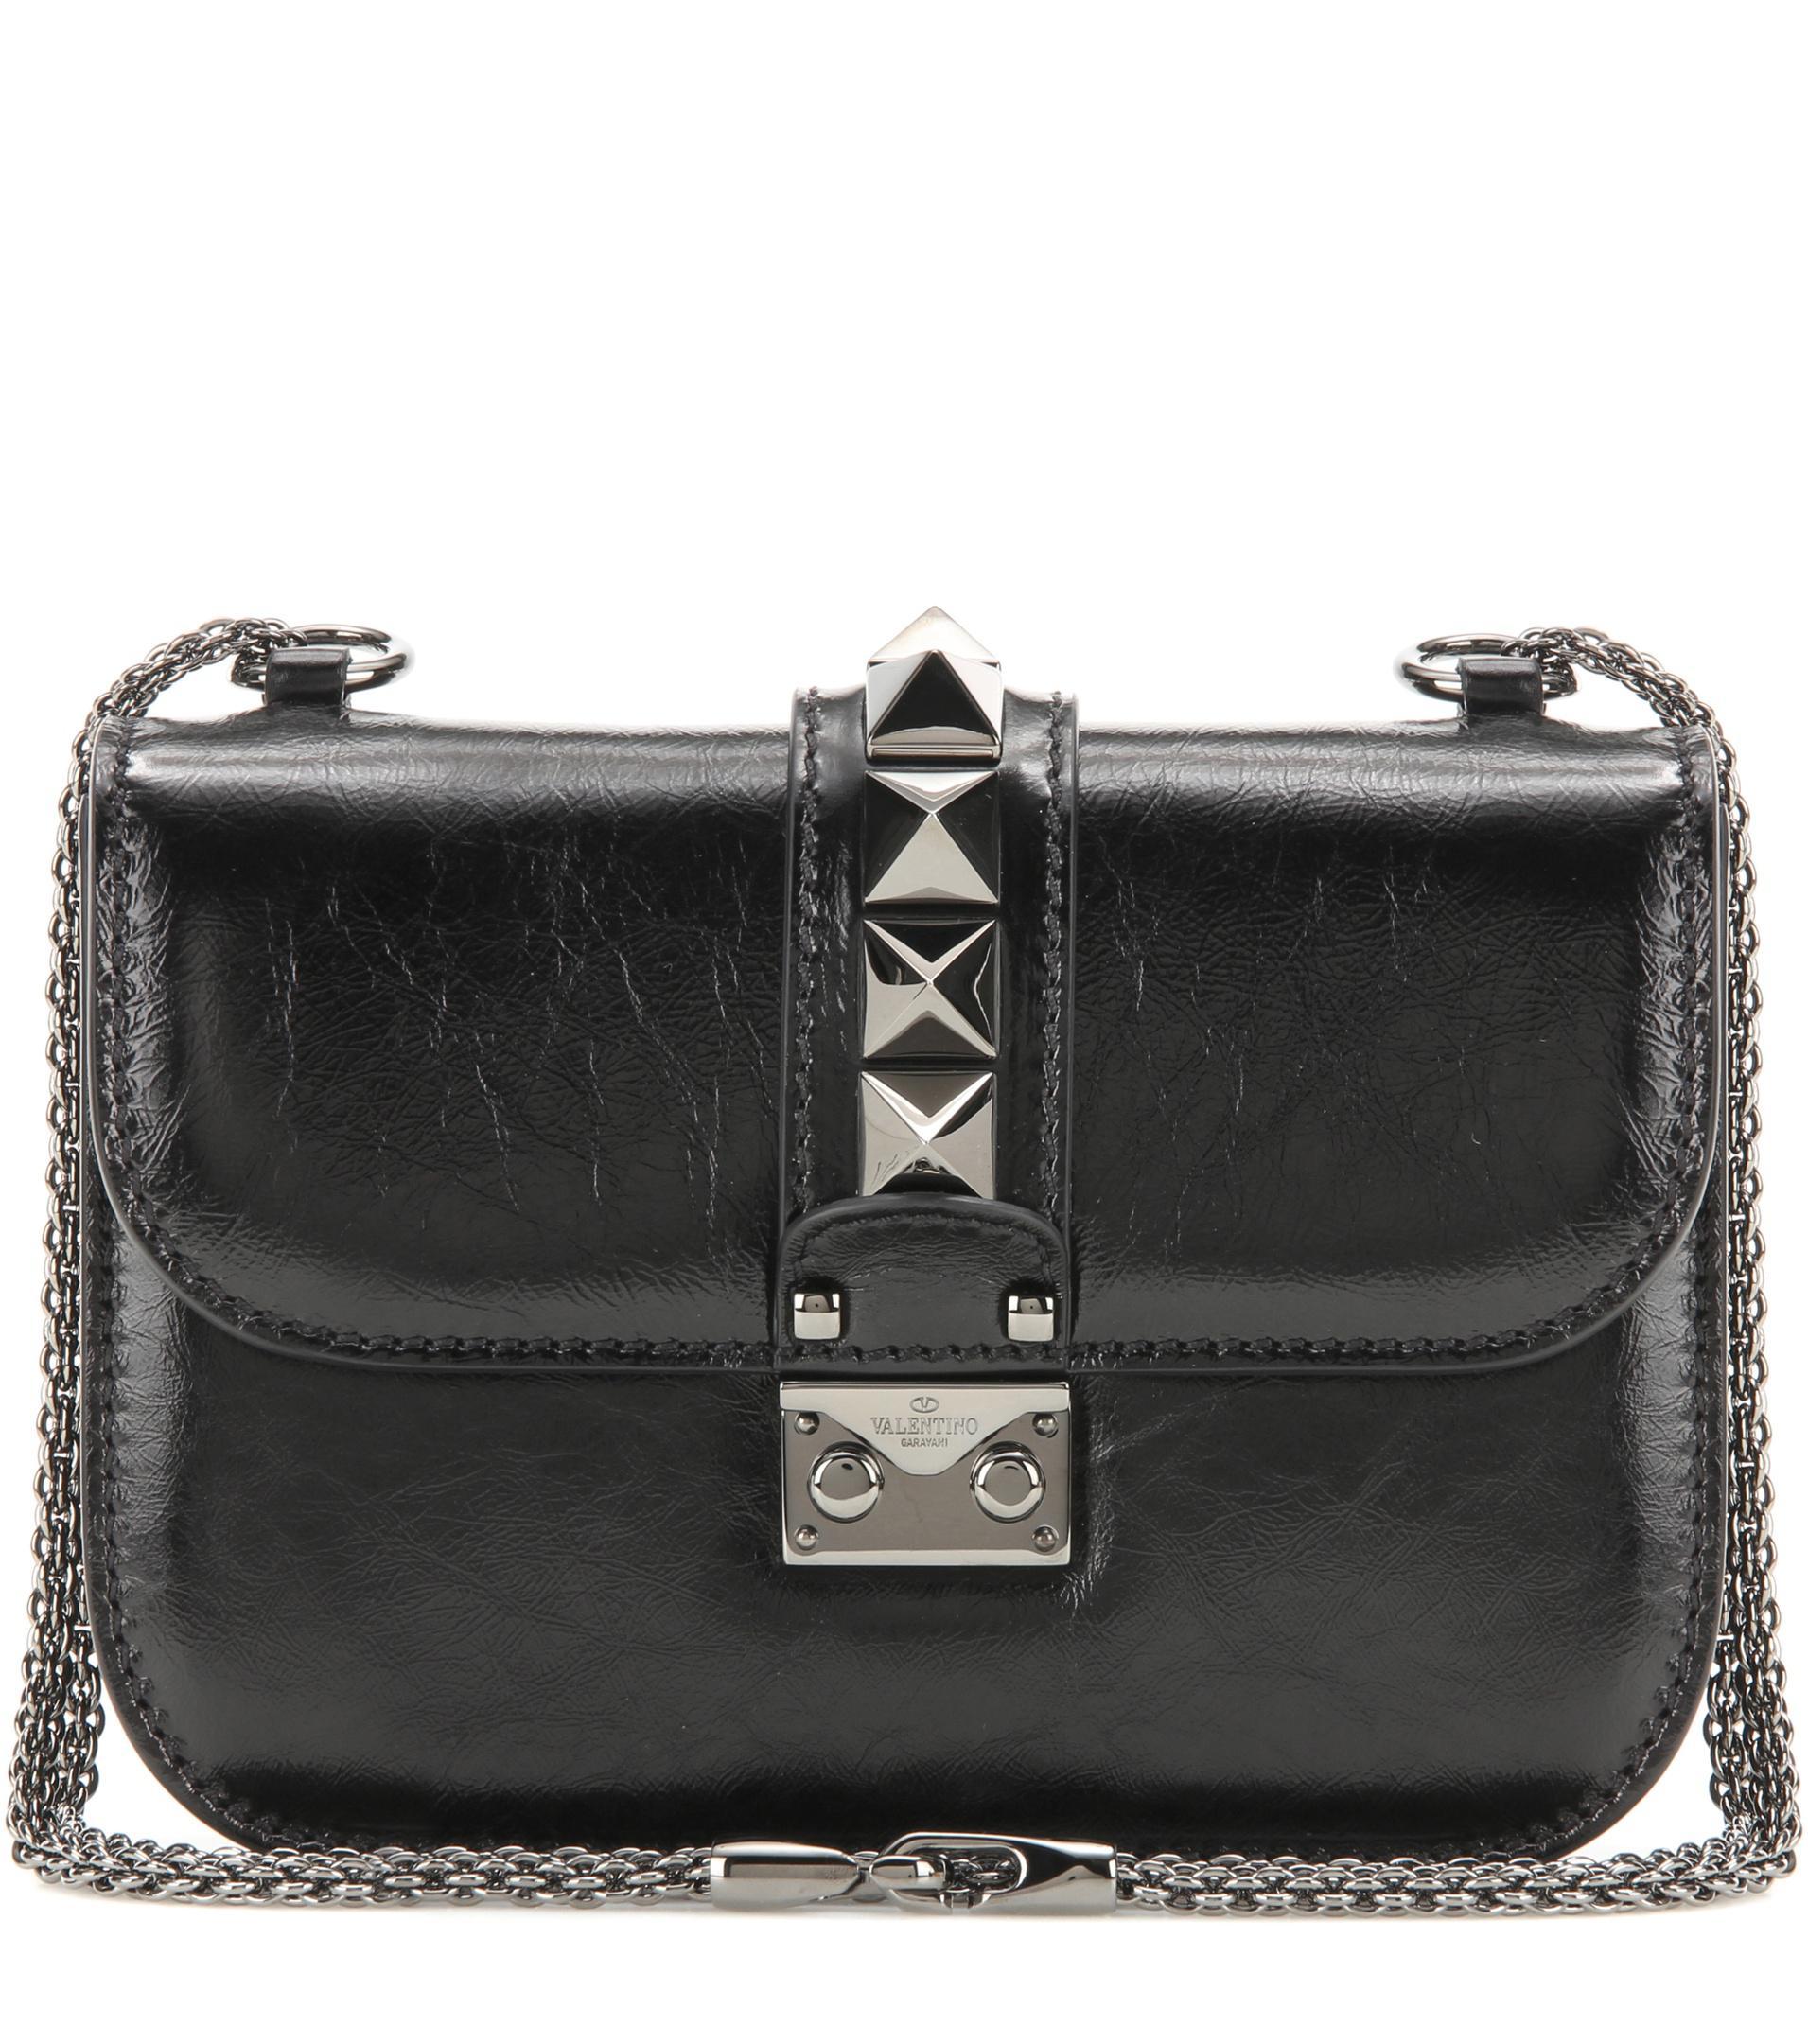 4ea0133fe0964 Lyst - Valentino Lock Noir Small Leather Shoulder Bag in Black